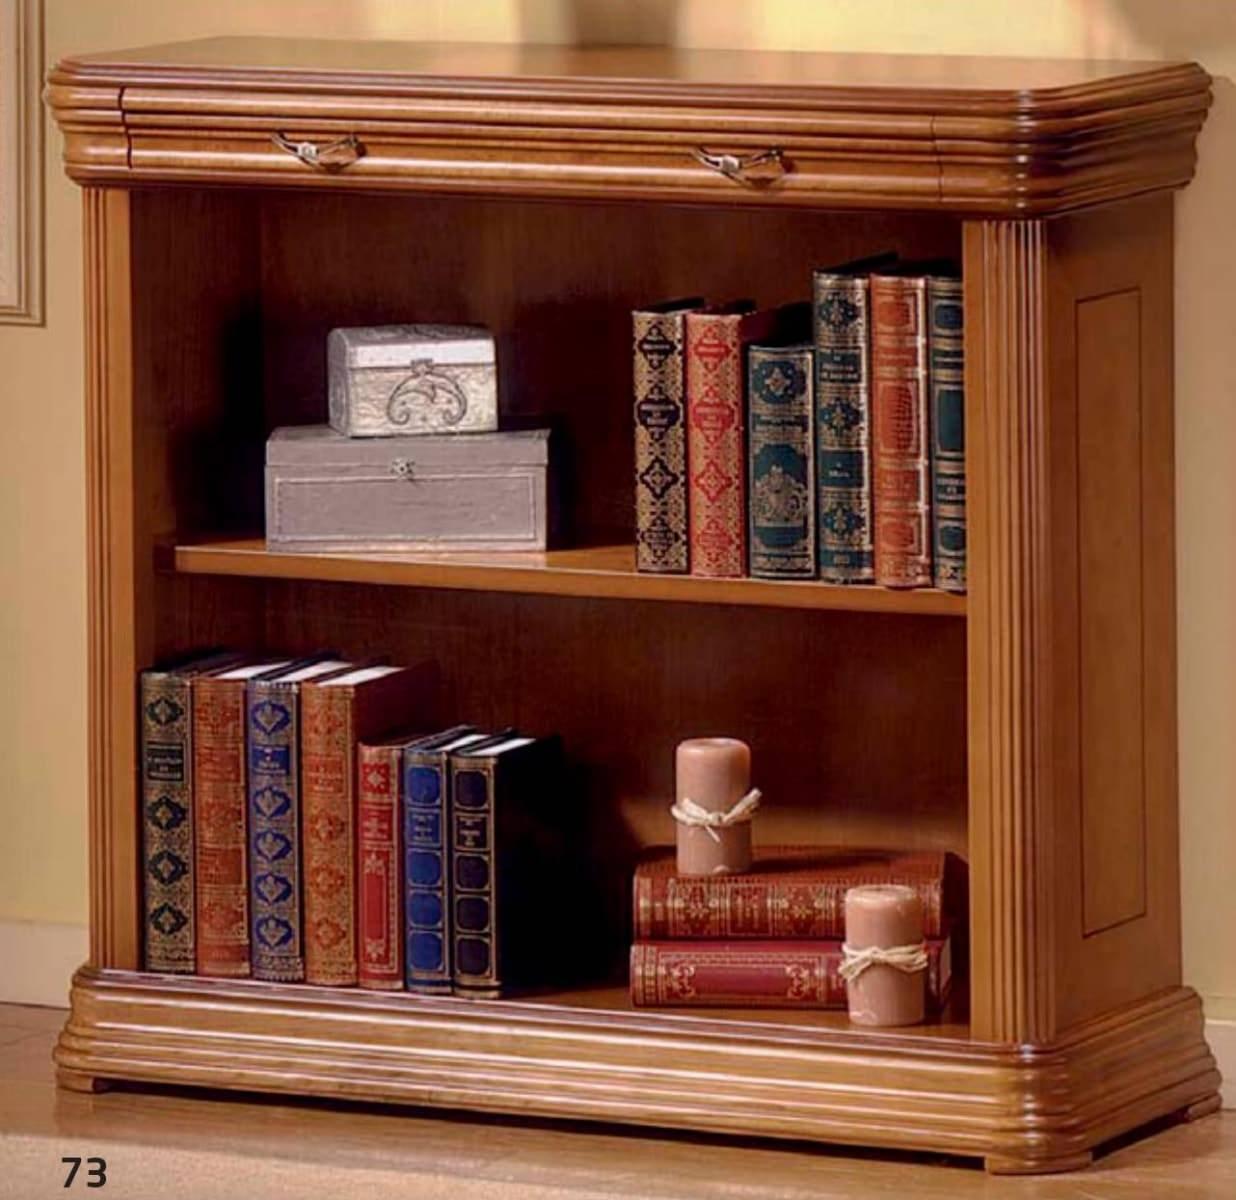 Книжный шкаф ref.73 IDC